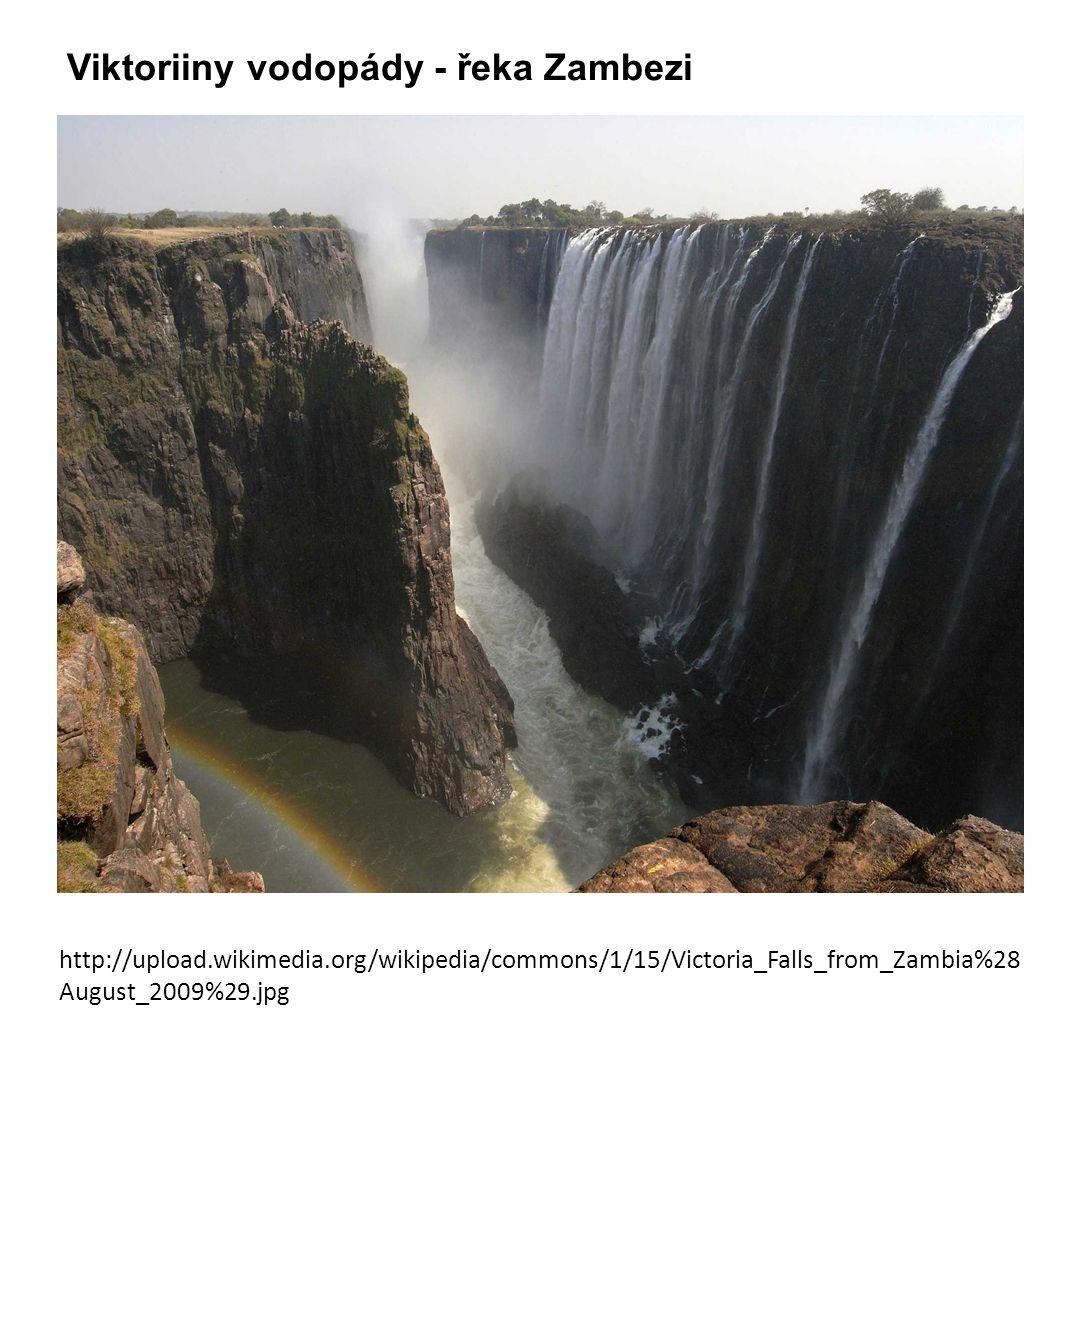 Viktoriiny vodopády - řeka Zambezi http://upload.wikimedia.org/wikipedia/commons/1/15/Victoria_Falls_from_Zambia%28 August_2009%29.jpg